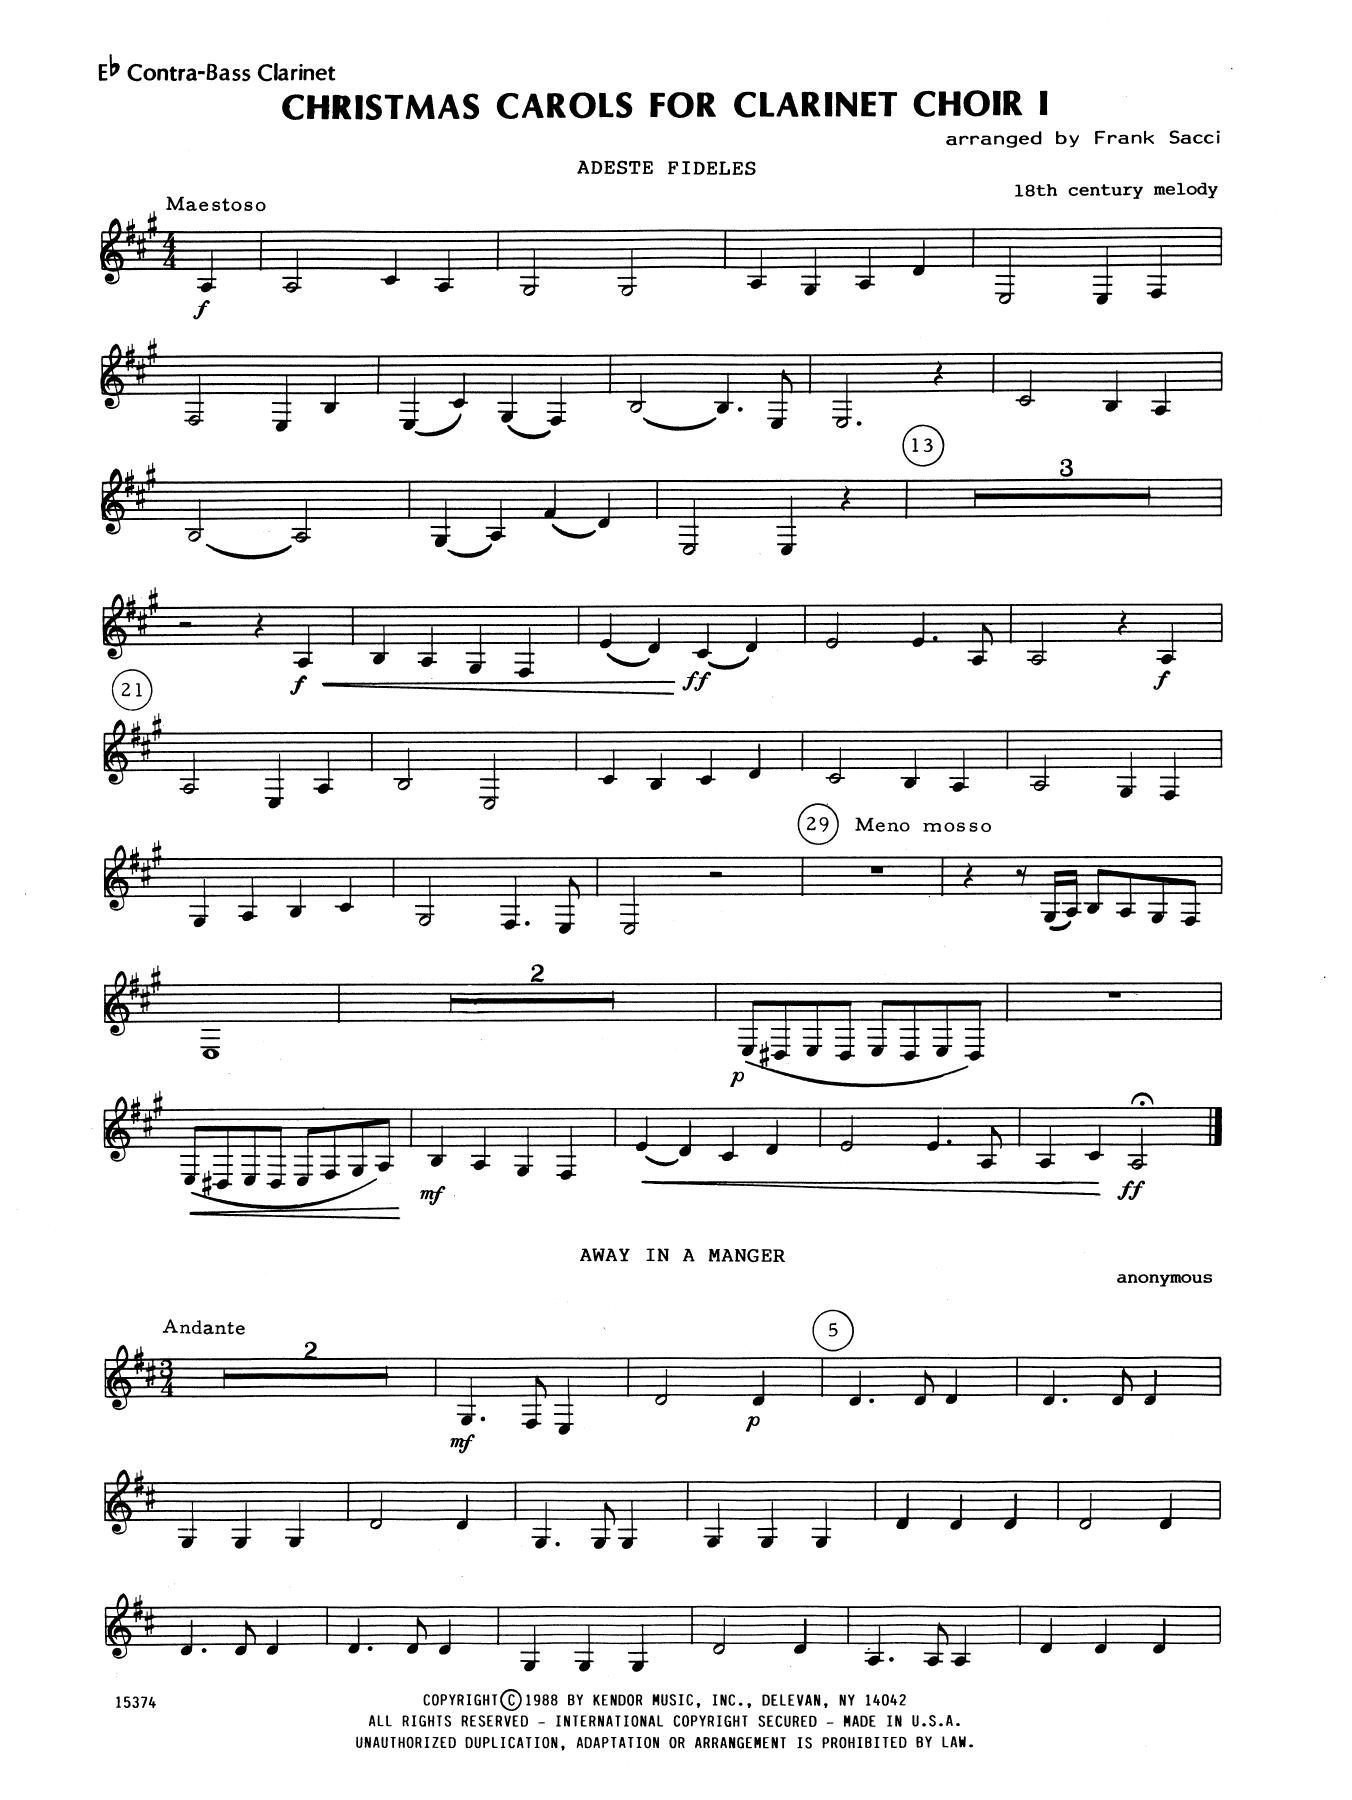 Clarinet Sheet Music Christmas.Christmas Carols For Clarinet Choir I Bb Contra Bass Clarinet By Frank Sacci Woodwind Ensemble Digital Sheet Music